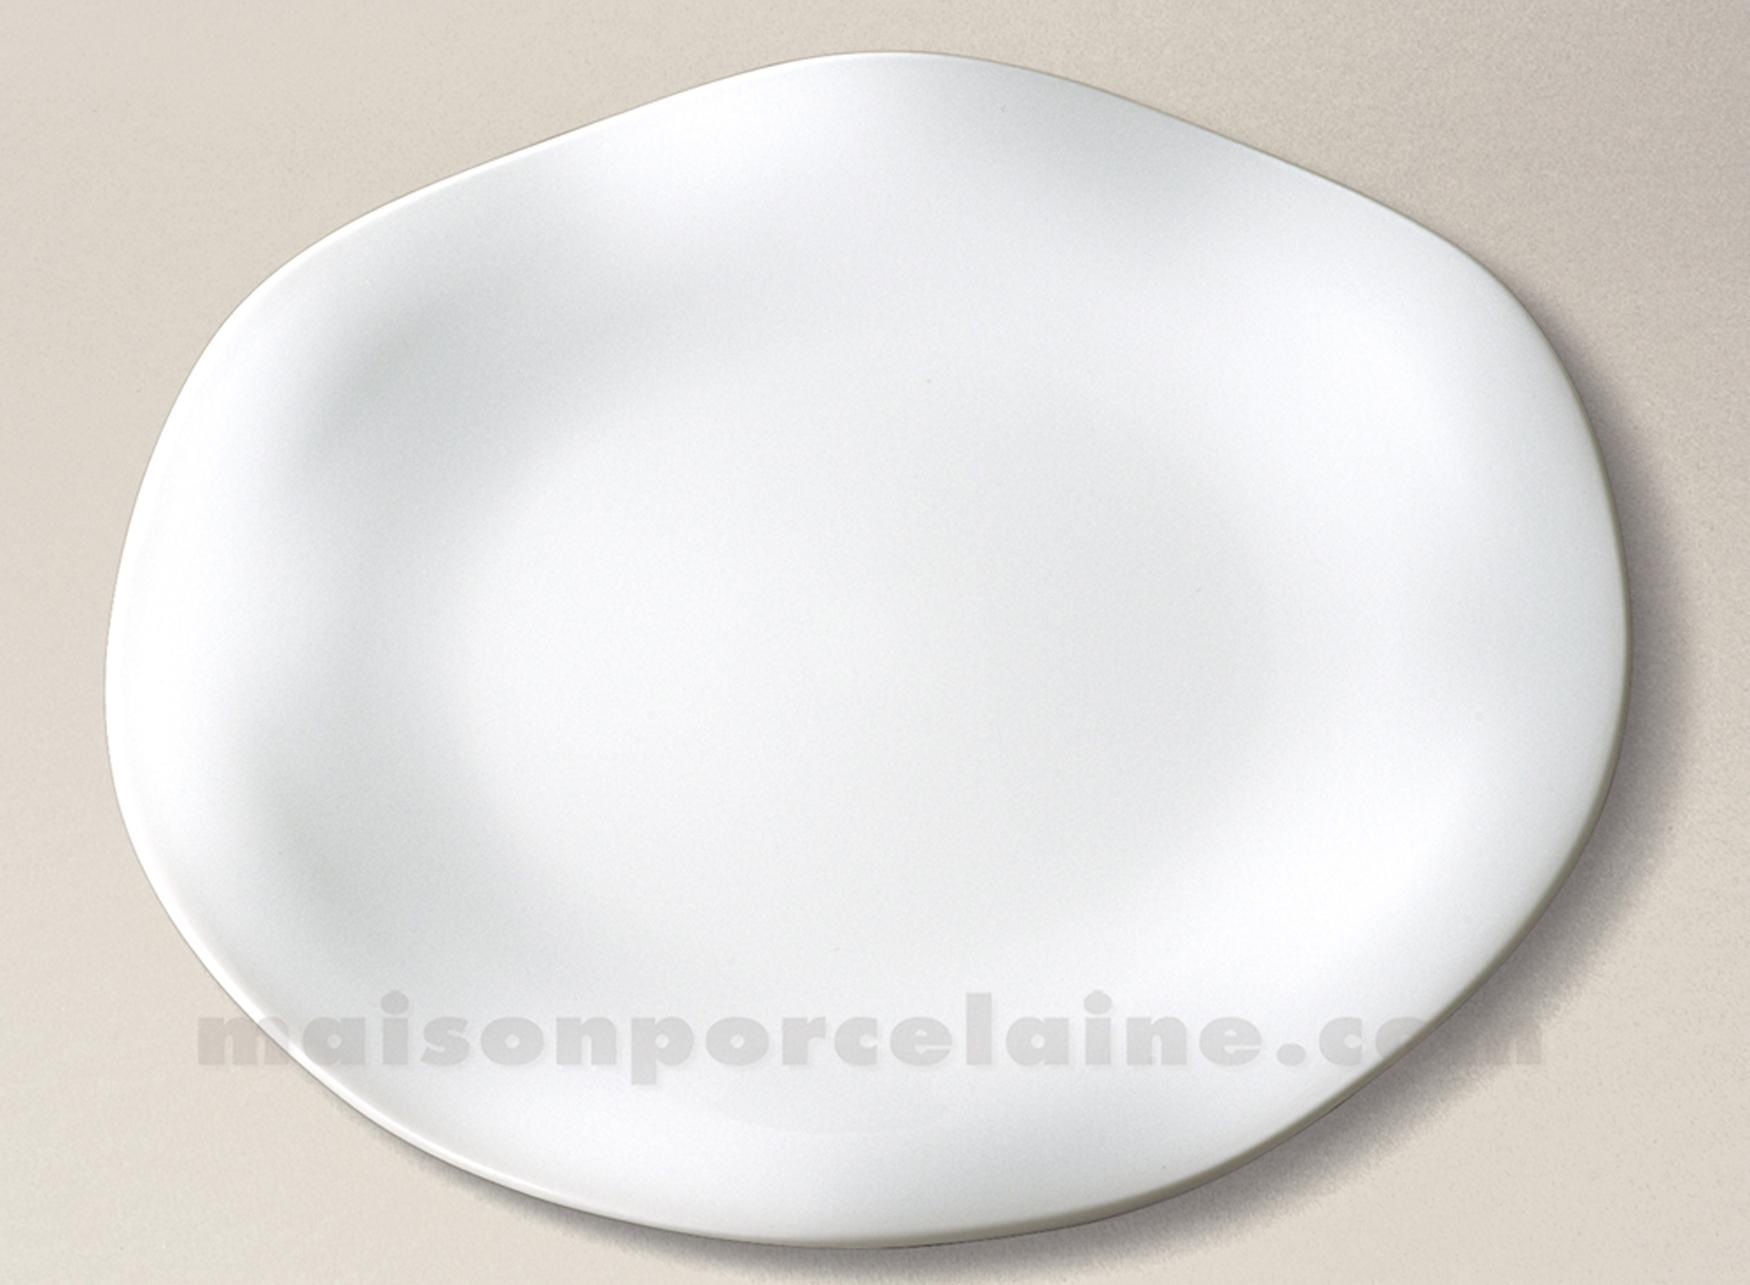 Assiette presentation limoges porcelaine blanche gala d32 maison de la porc - La porcelaine blanche ...